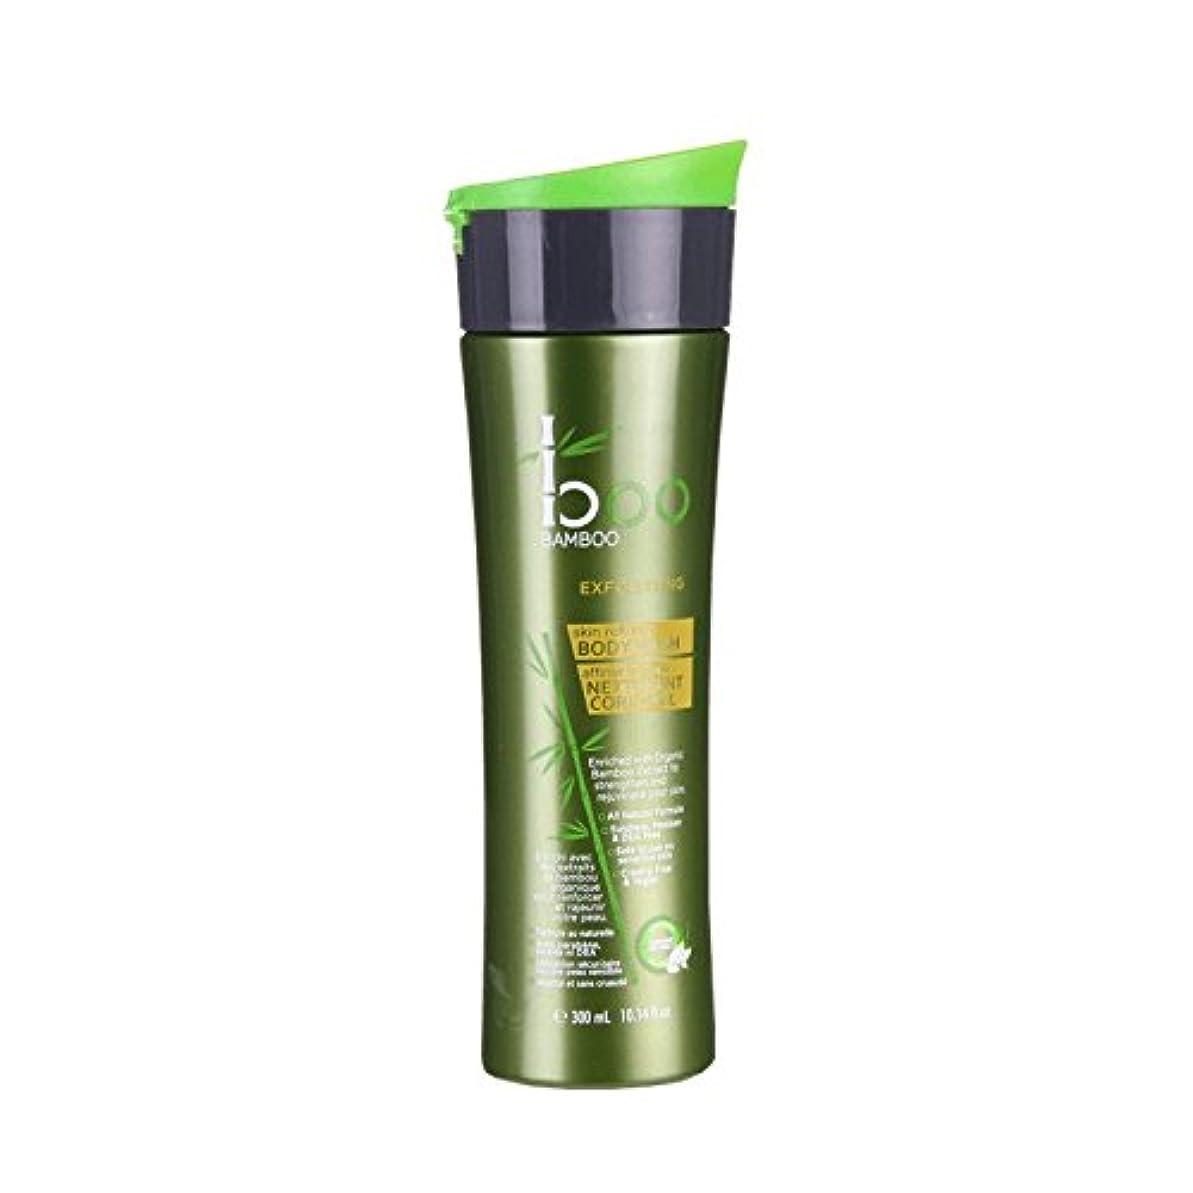 Boo Bamboo Exfoliating Body Wash 300ml (Pack of 2) - 竹ピーリングボディウォッシュ300ミリリットルブーイング (x2) [並行輸入品]